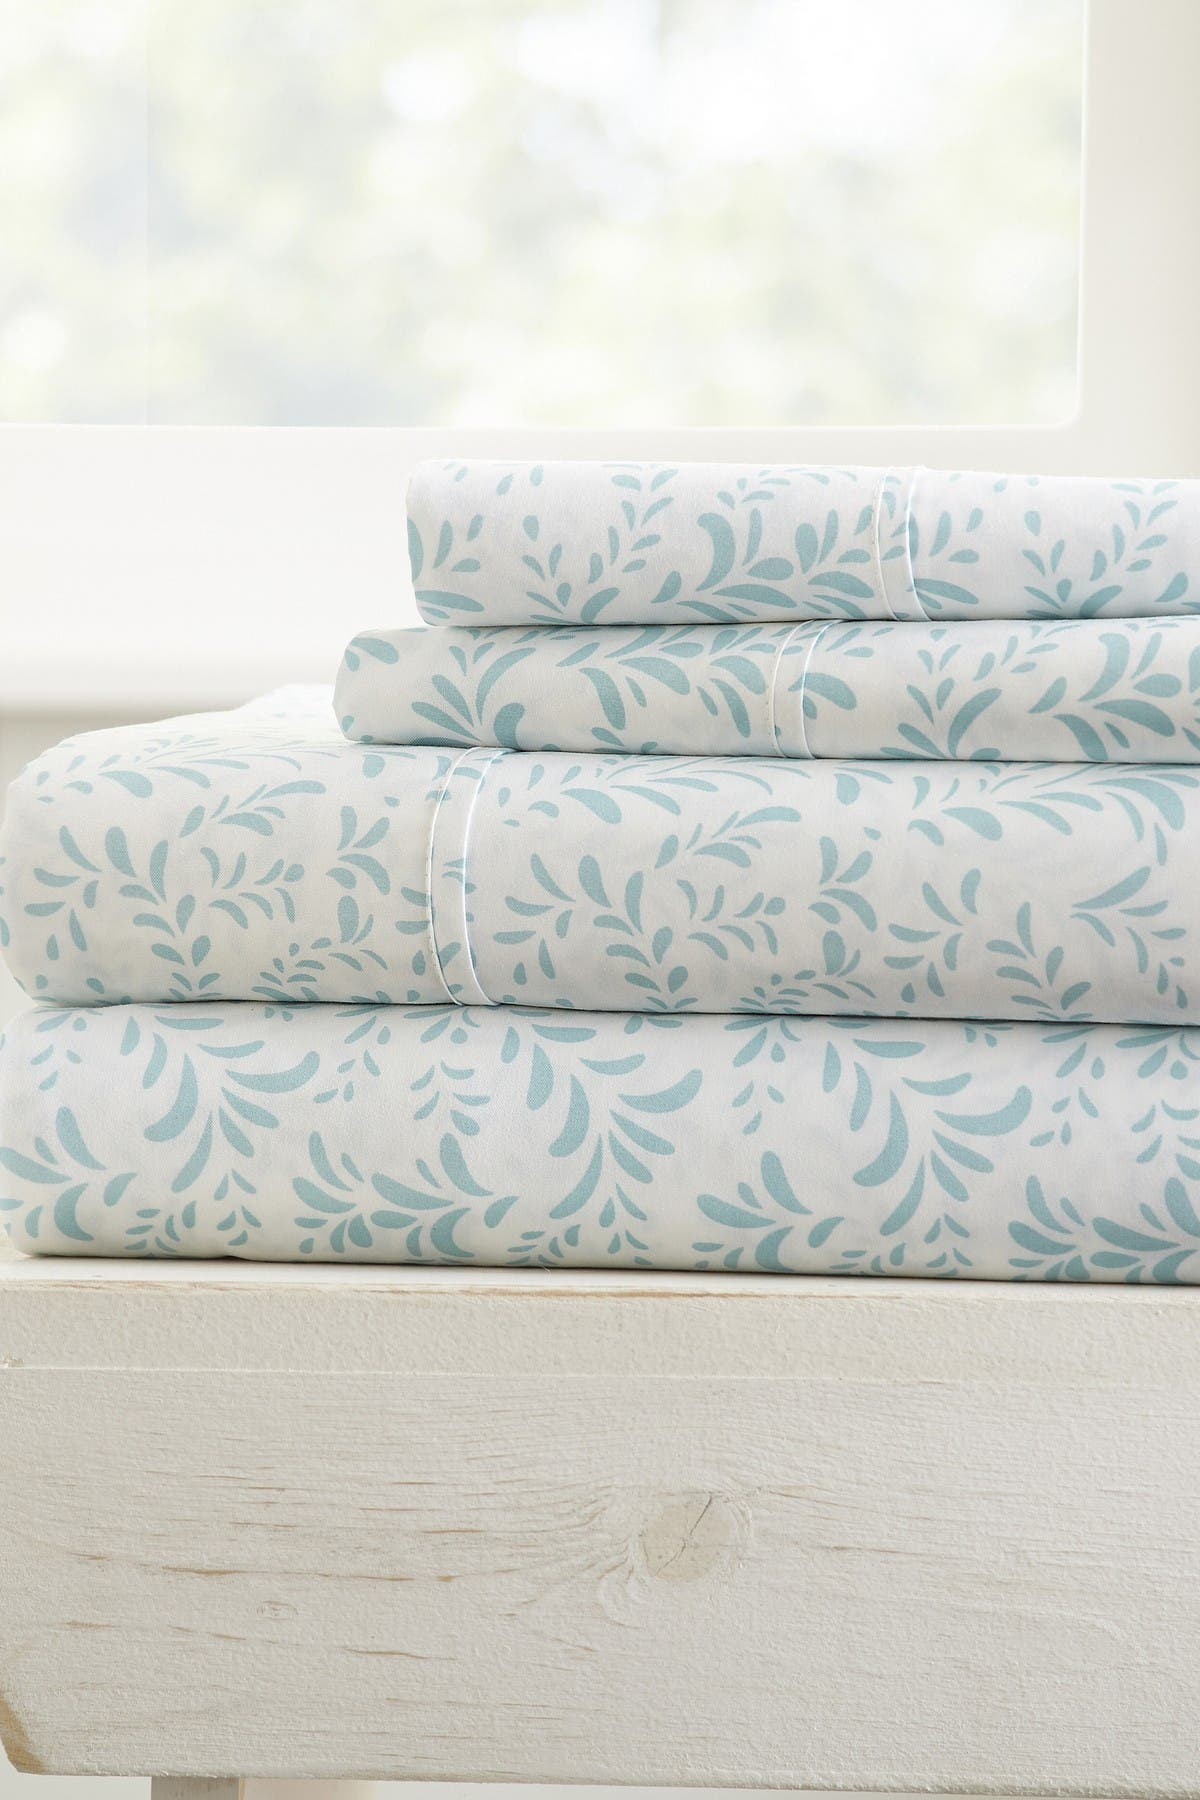 Image of IENJOY HOME Home Spun Premium Ultra Burst of Vines Pattern 3-Piece Twin Bed Sheet Set - Light Blue